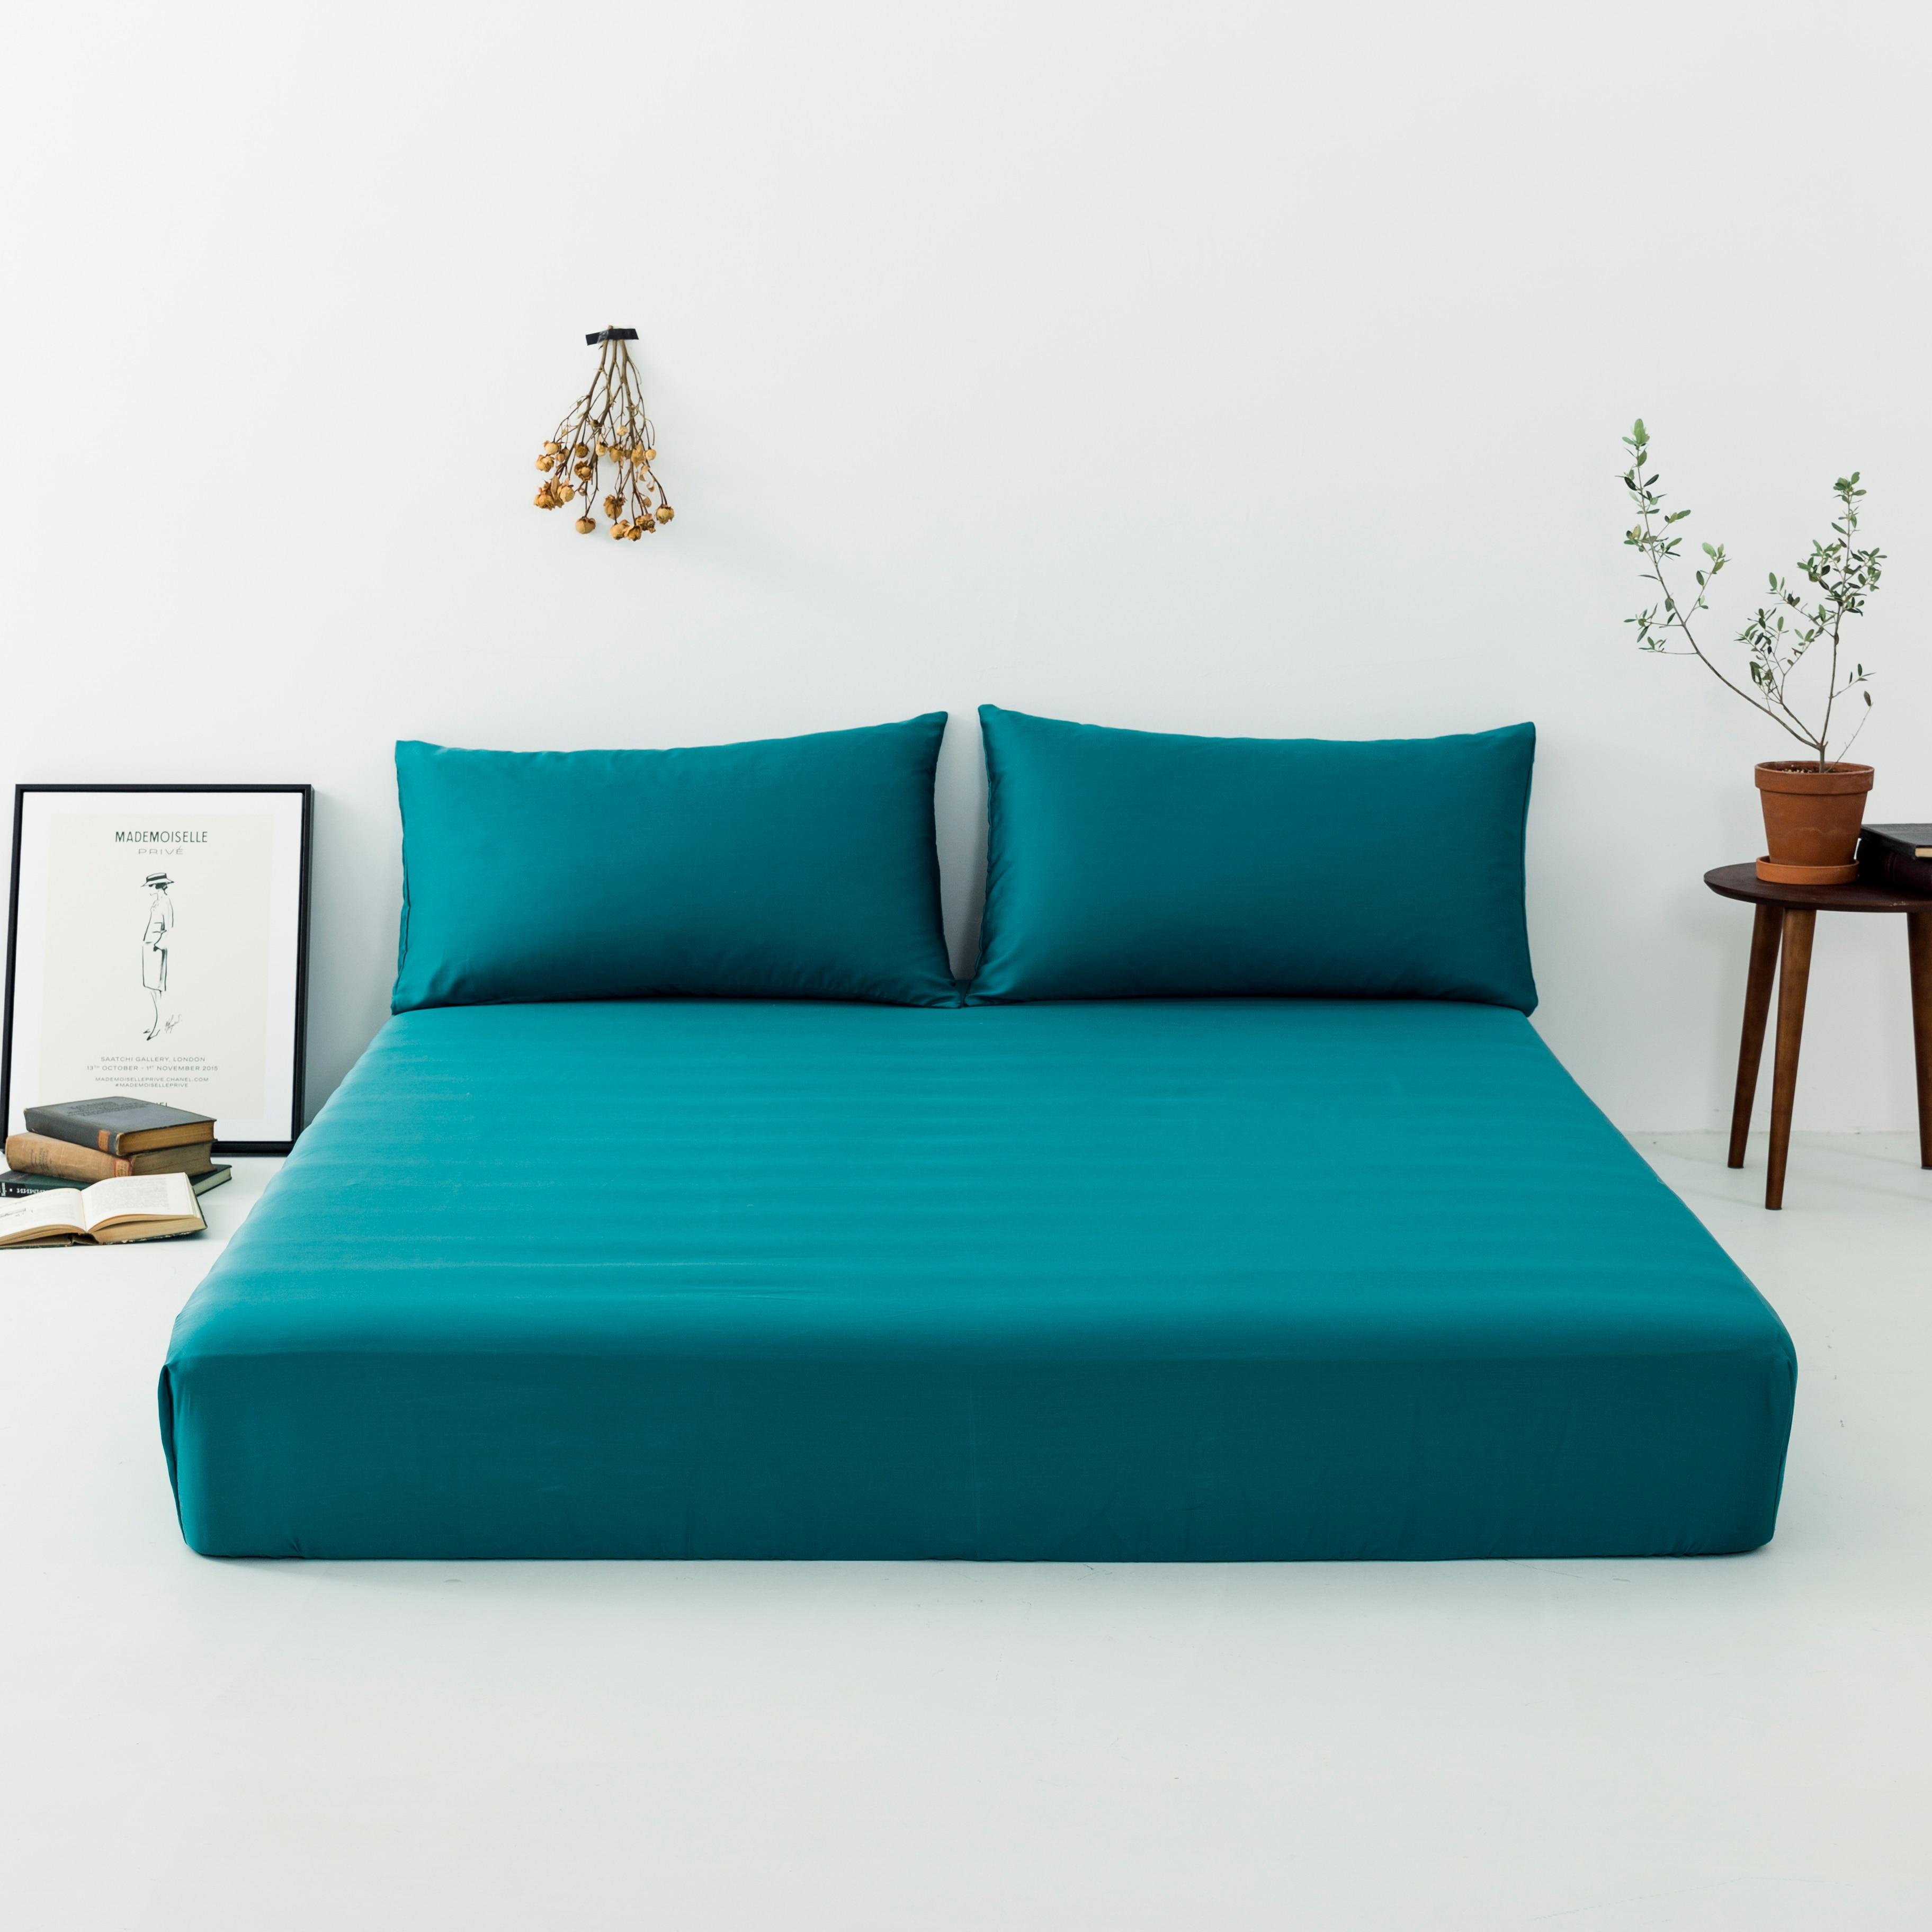 Liv Esthete Luxury Green 100 Mulberry Silk Fitted Sheet Silky Mattress Cover Queen King Bed Sheets Pillowcase For Women Men in Sheet from Home Garden